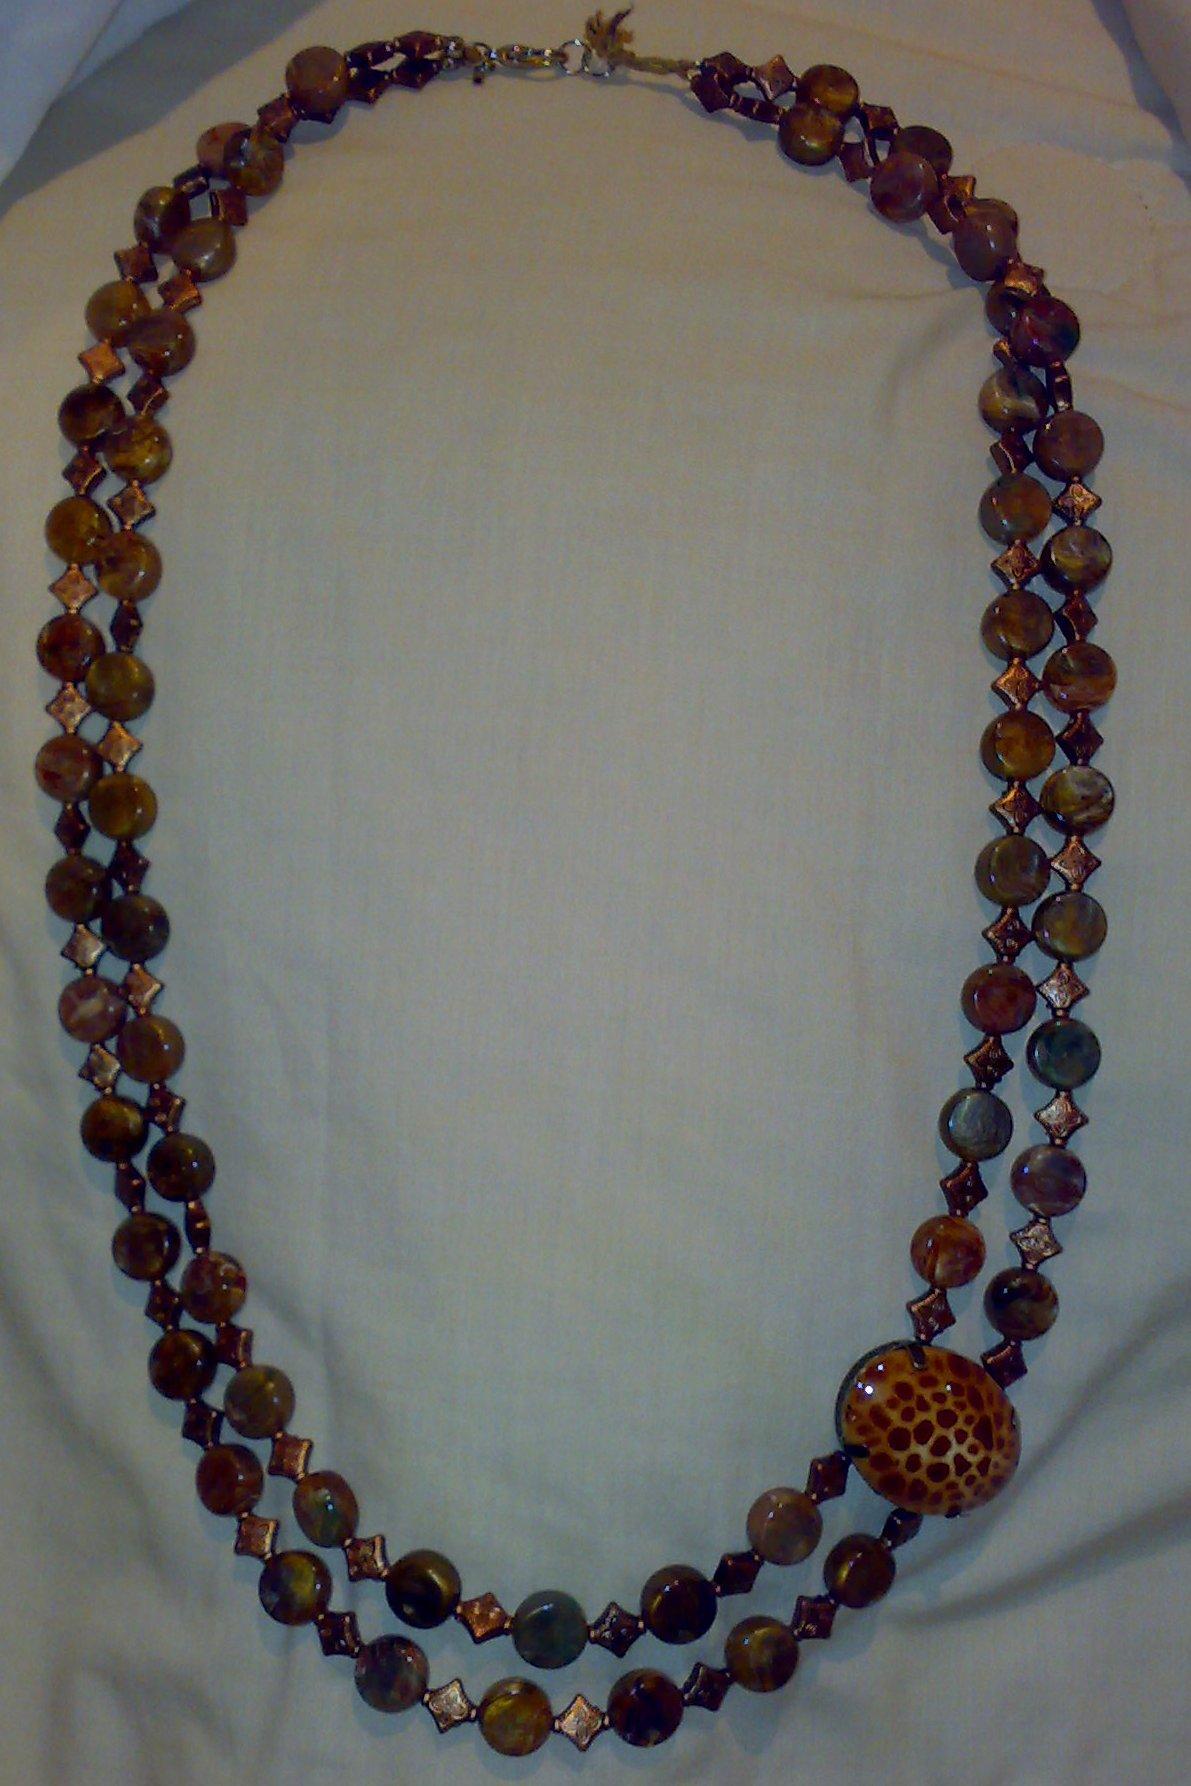 Unique handmade necklaces